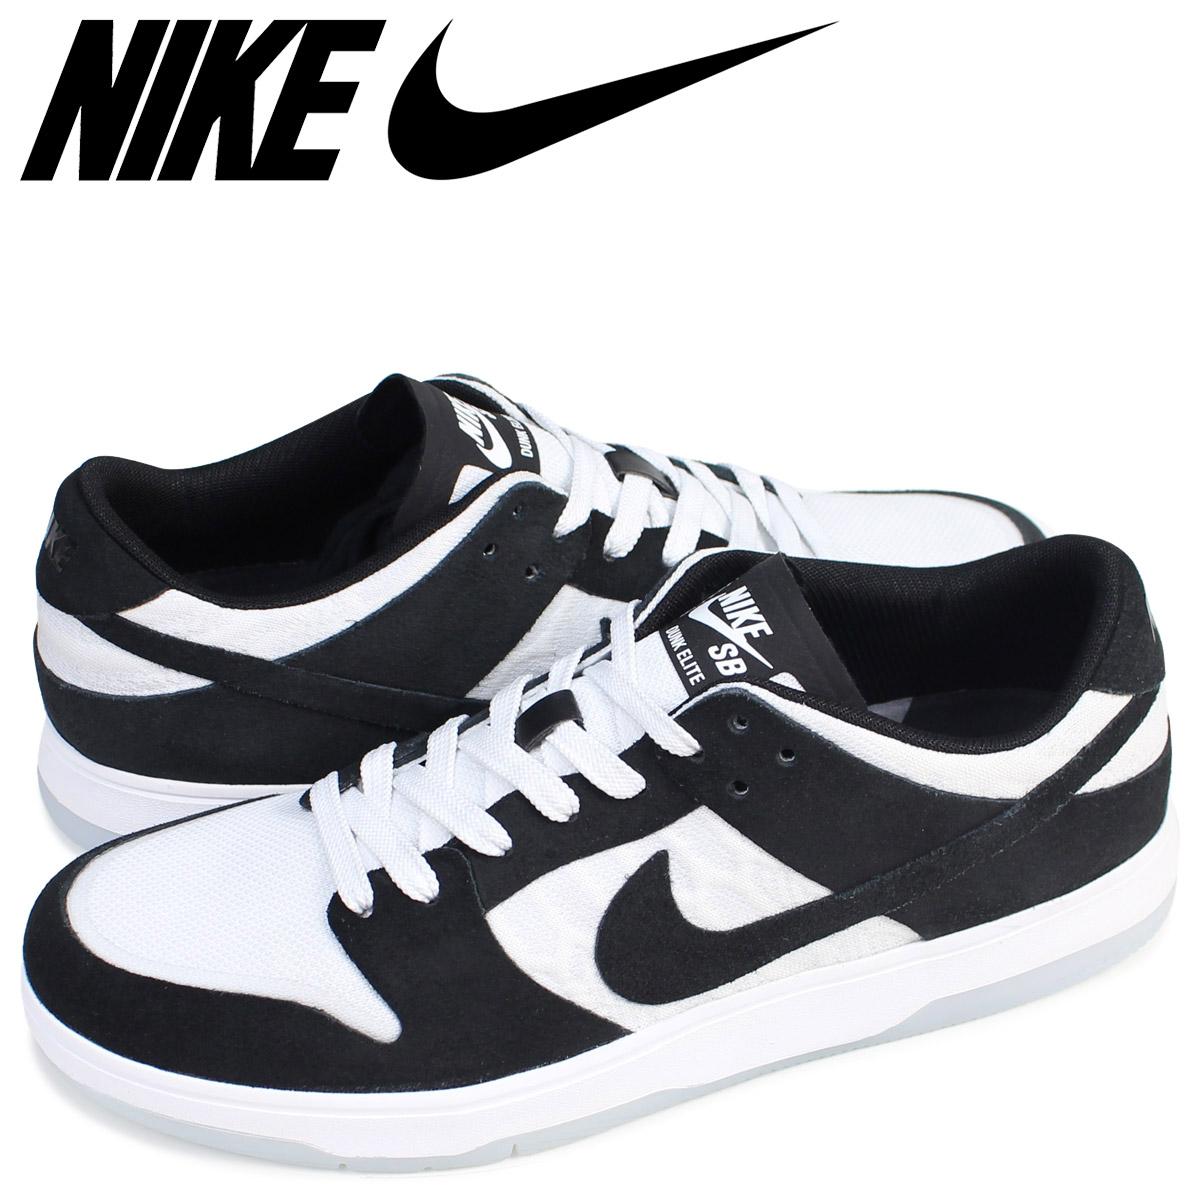 new concept a44fe 19311 SneaK Online Shop Nike NIKE SB dunk low sneakers ZOOM DUNK LOW ELITE QS  OSKI 877,063-001 mens shoes black  Rakuten Global Market